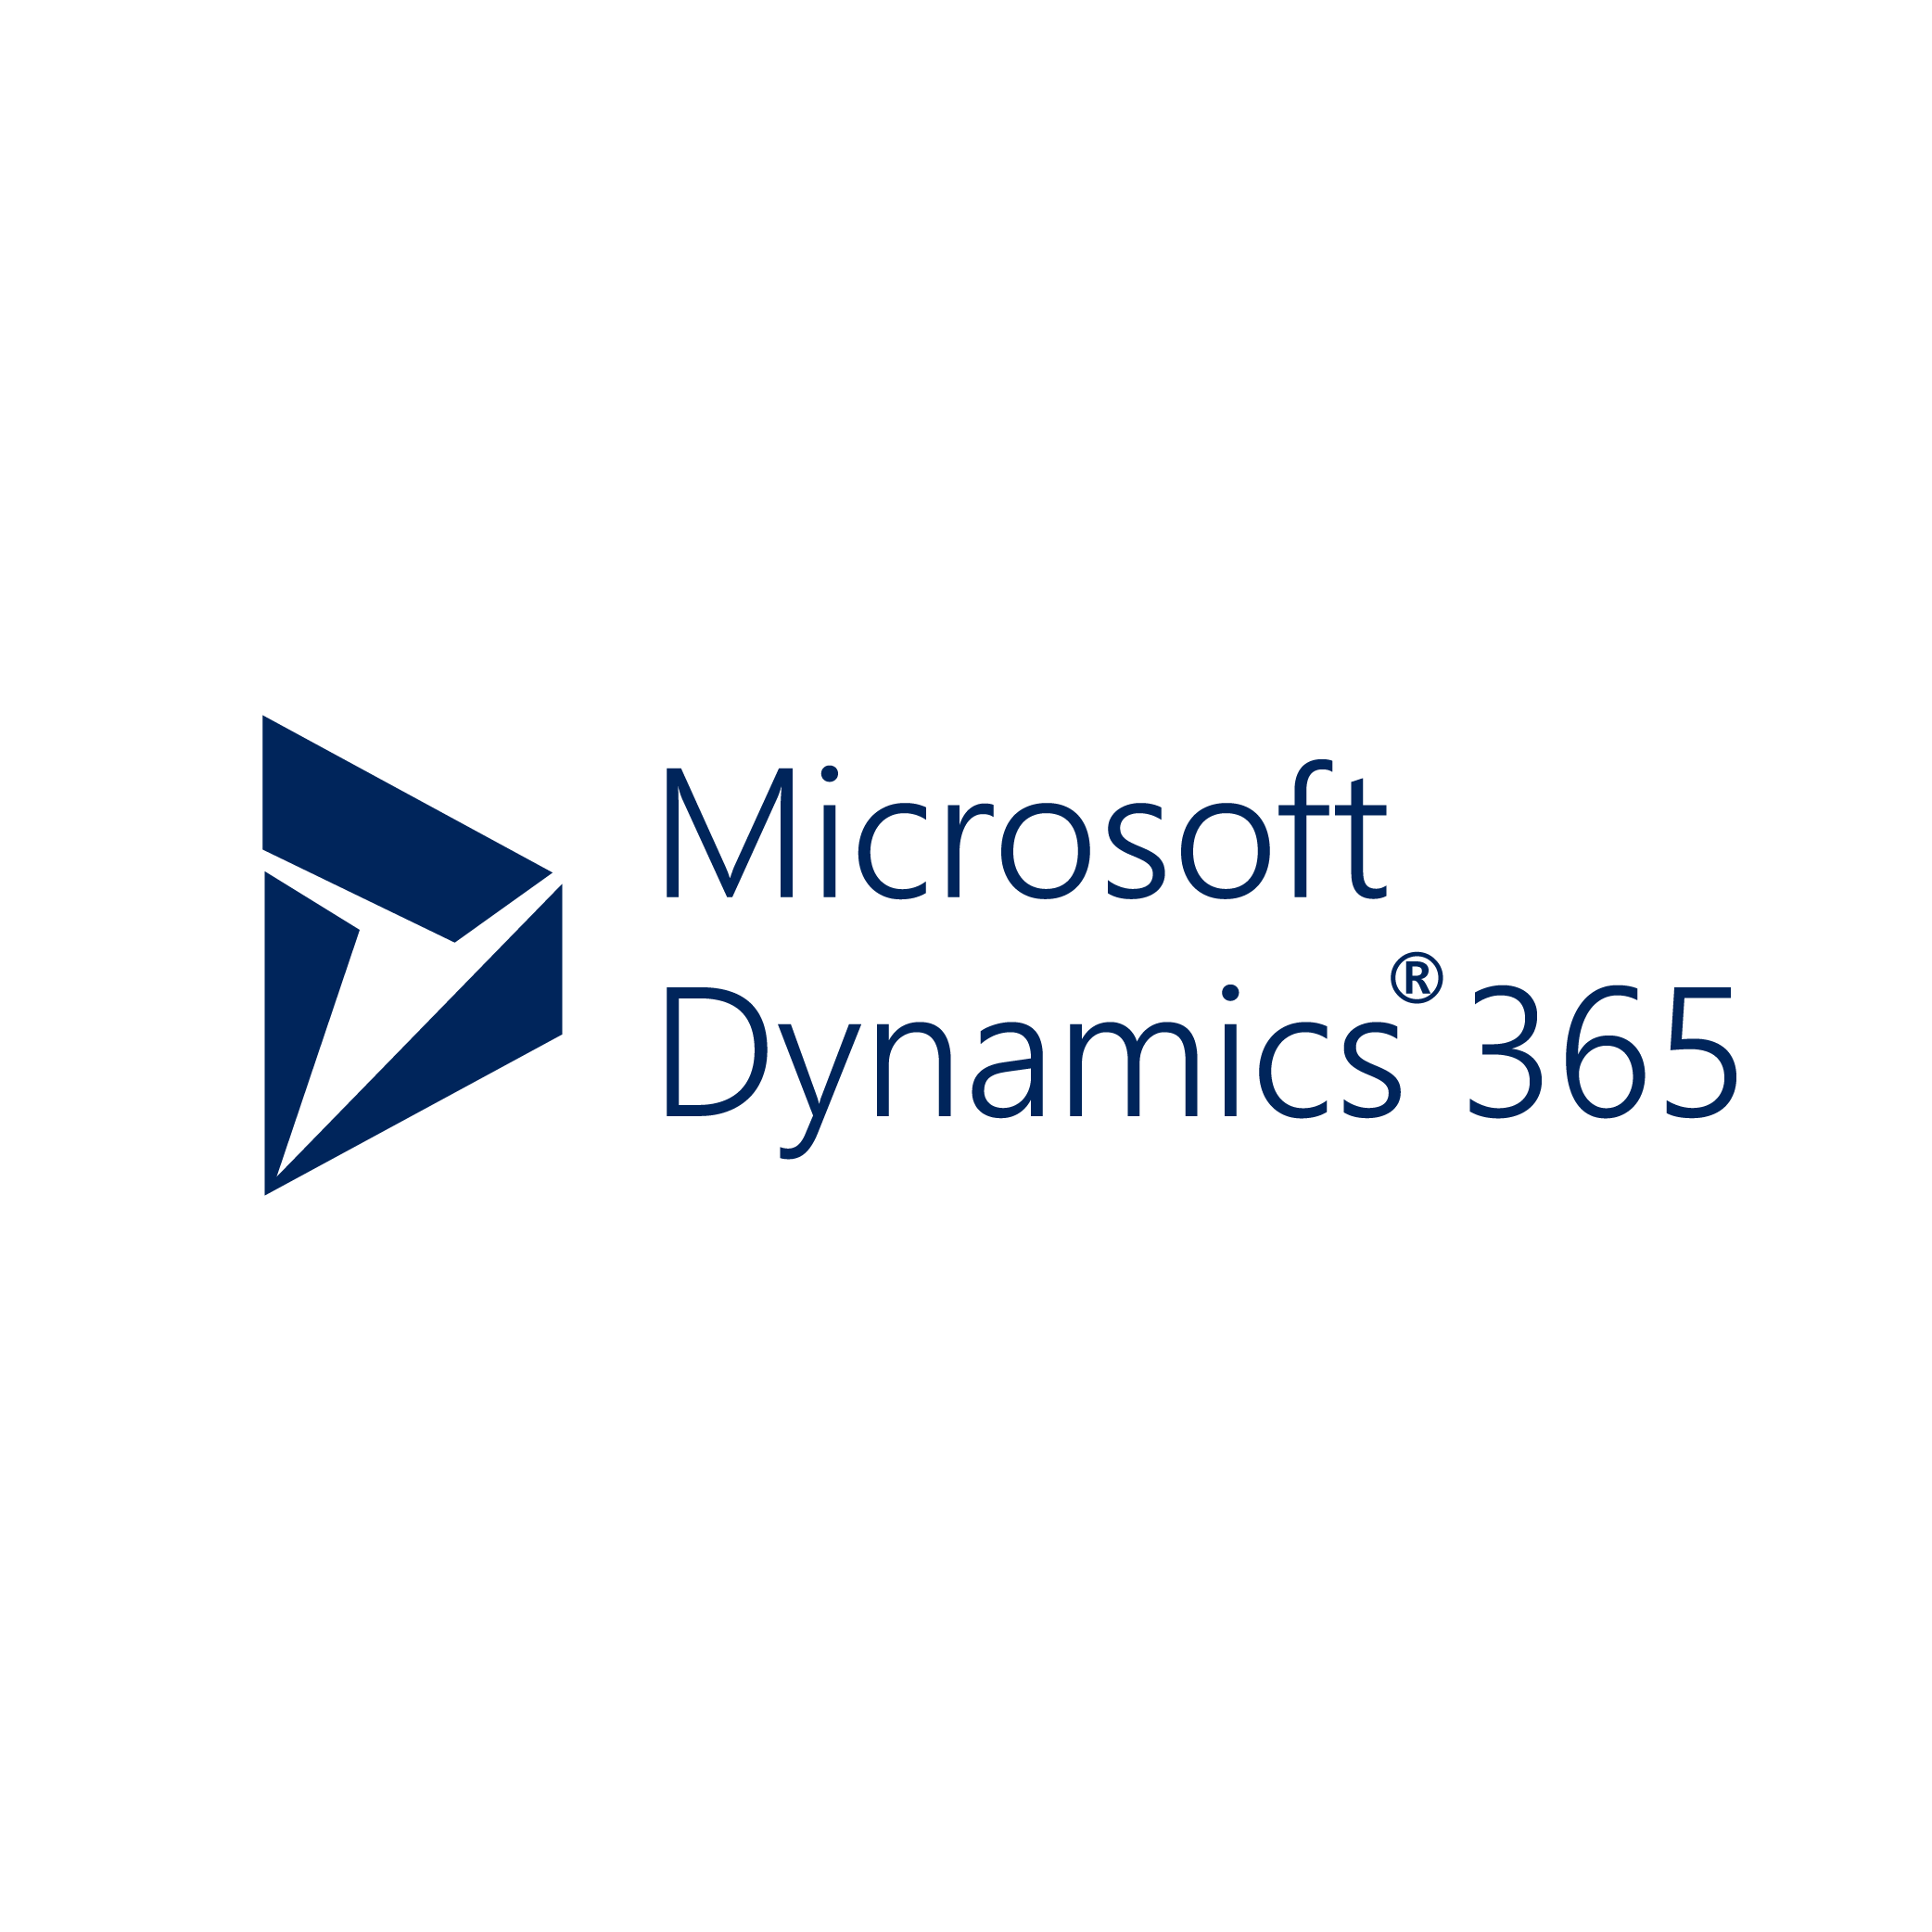 Microsoft Dynamics 365 ERP logo